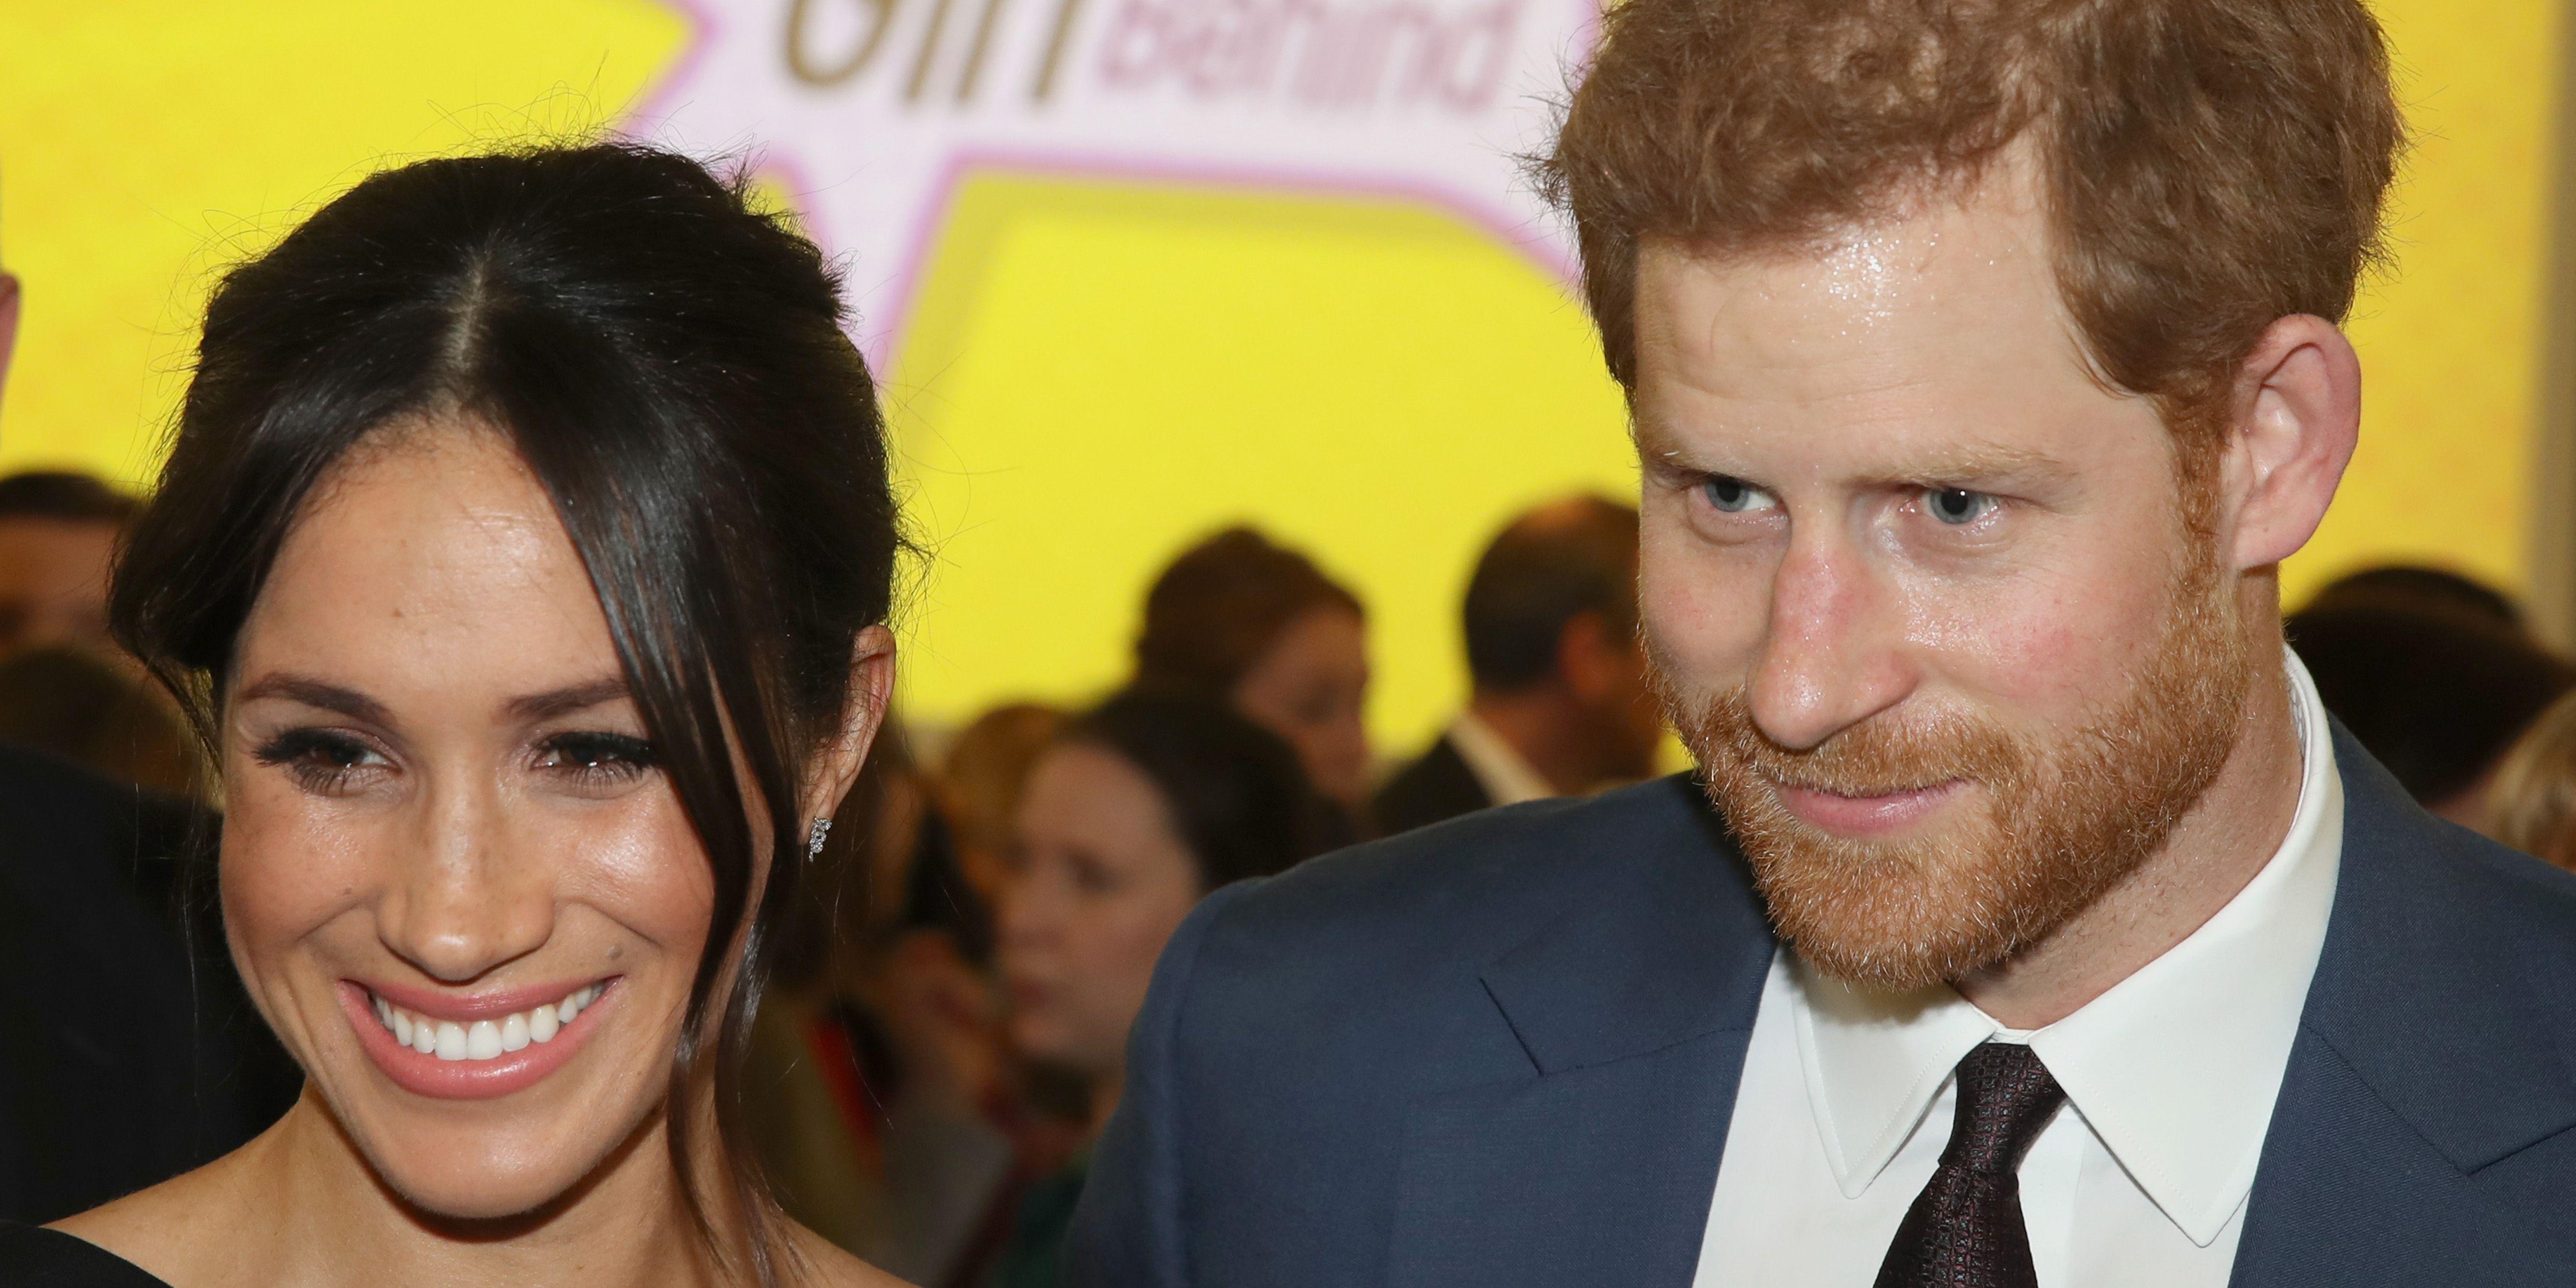 prince-harry-meghan-markle-family-royal-wedding